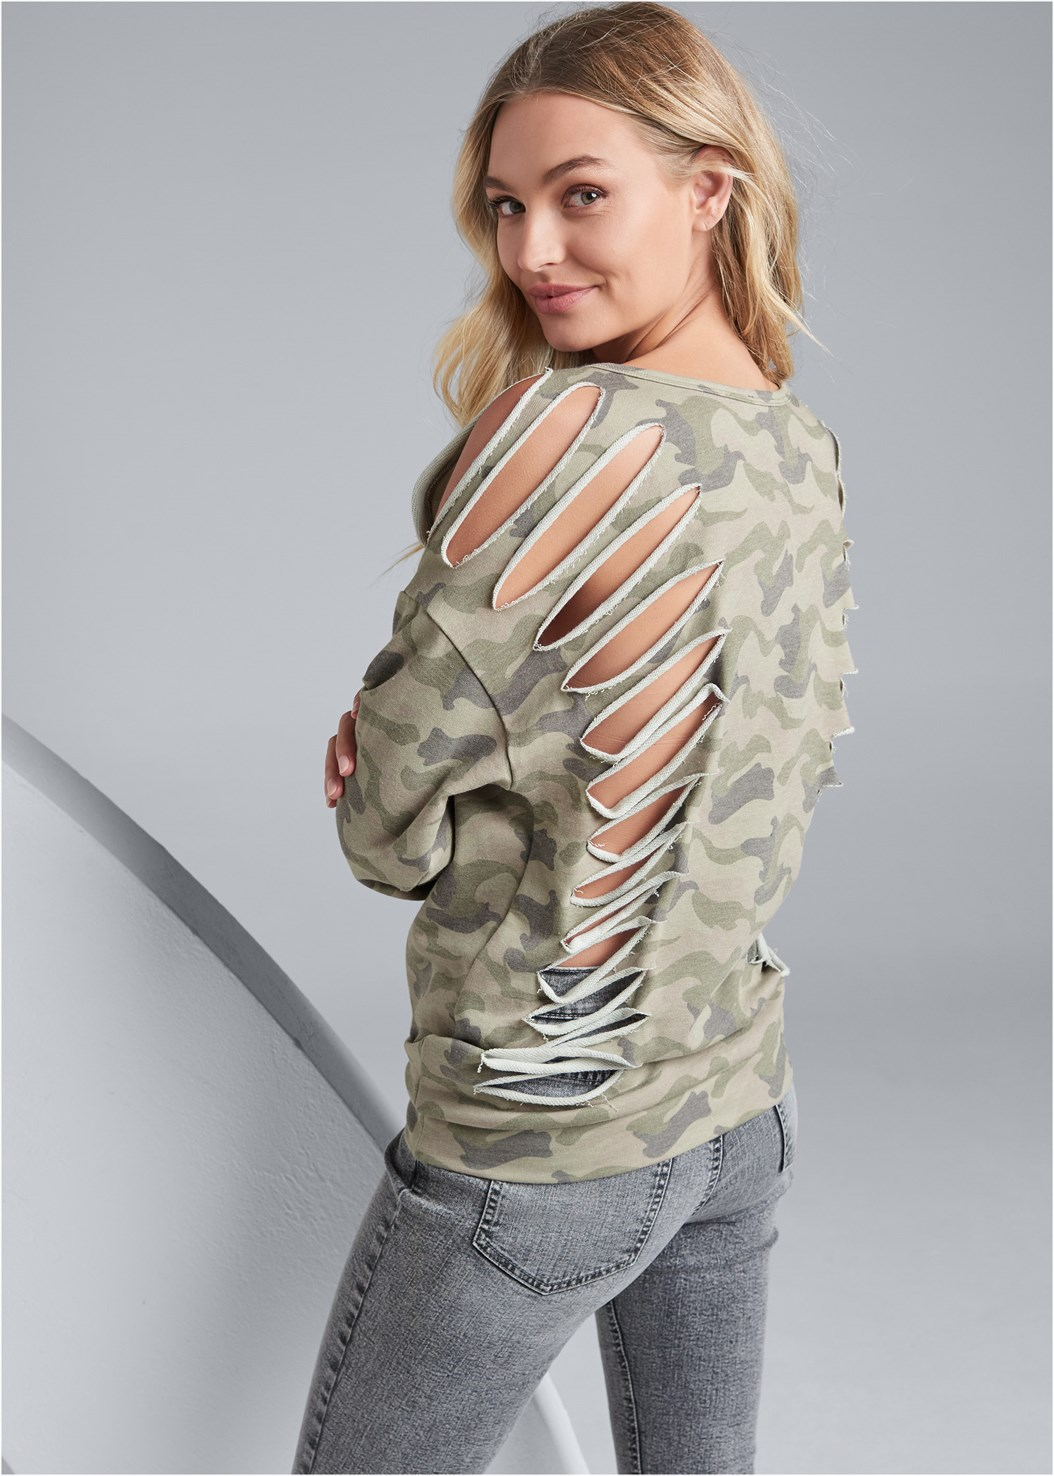 Slash Detail Sweatshirt,Washed Kick Flare Jeans,Ribbed Bandeau,Wrap Stitch Detail Booties